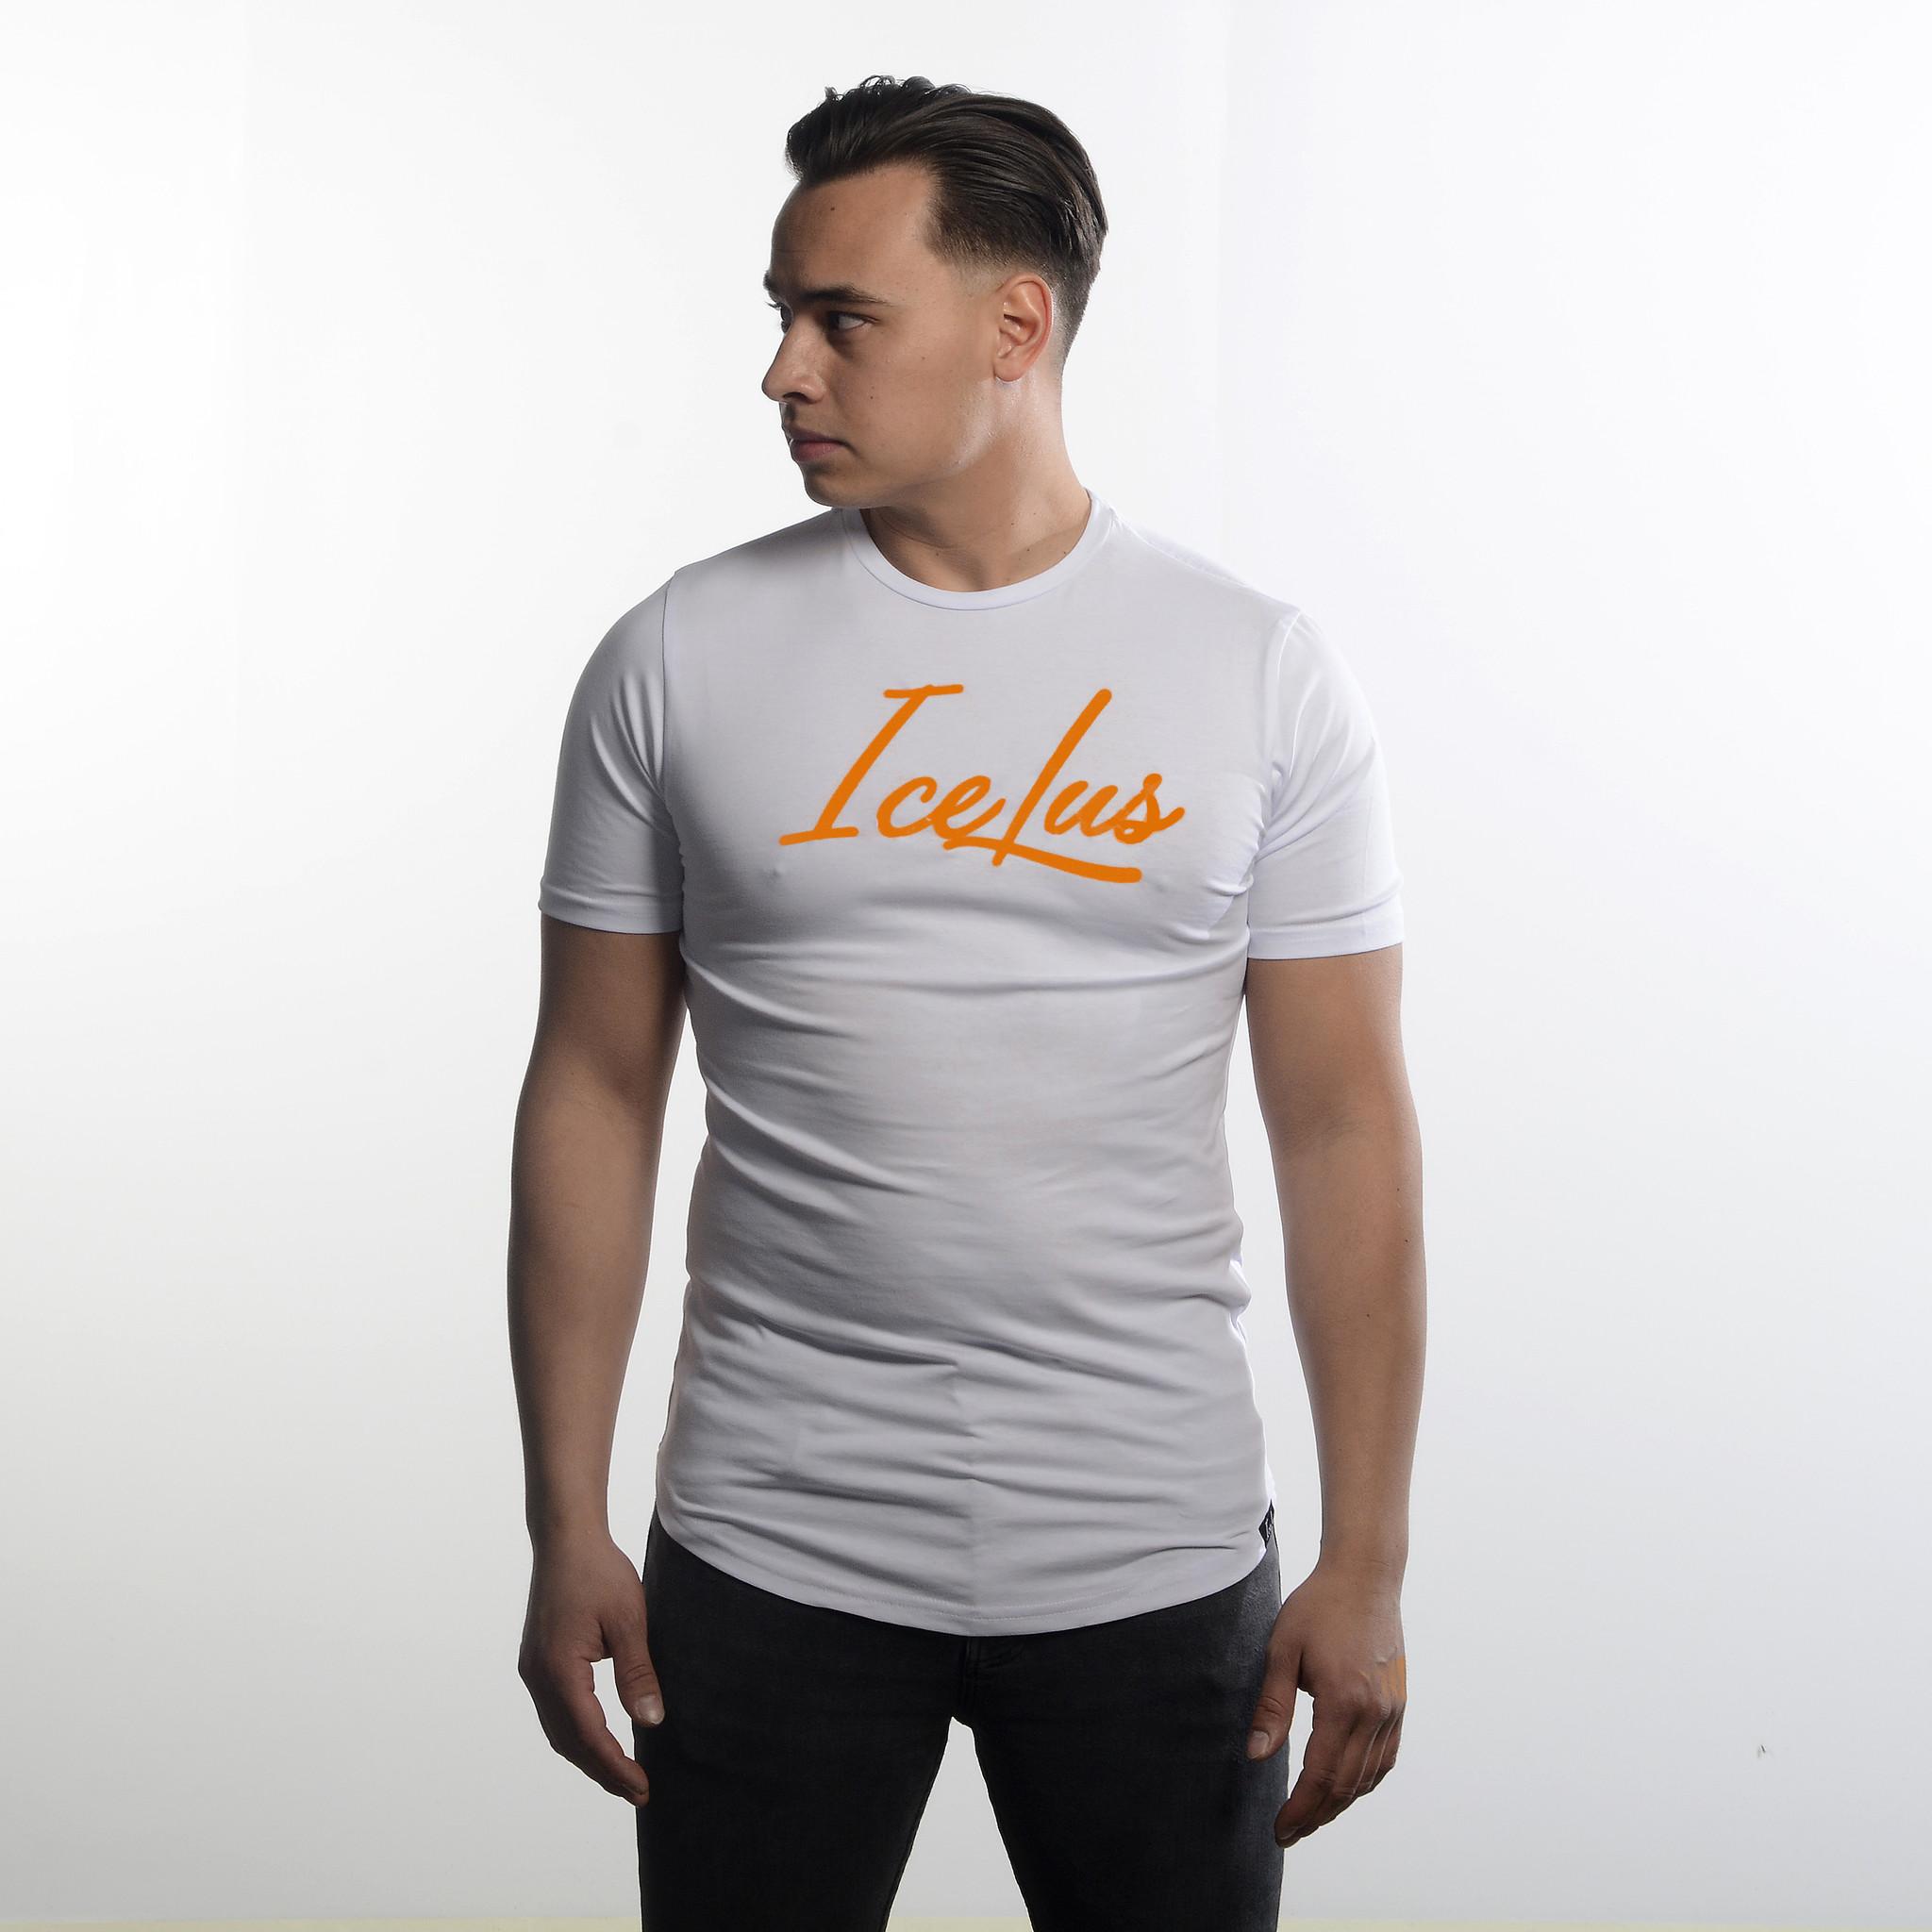 Icelus Clothing Icelus Series Orange on White